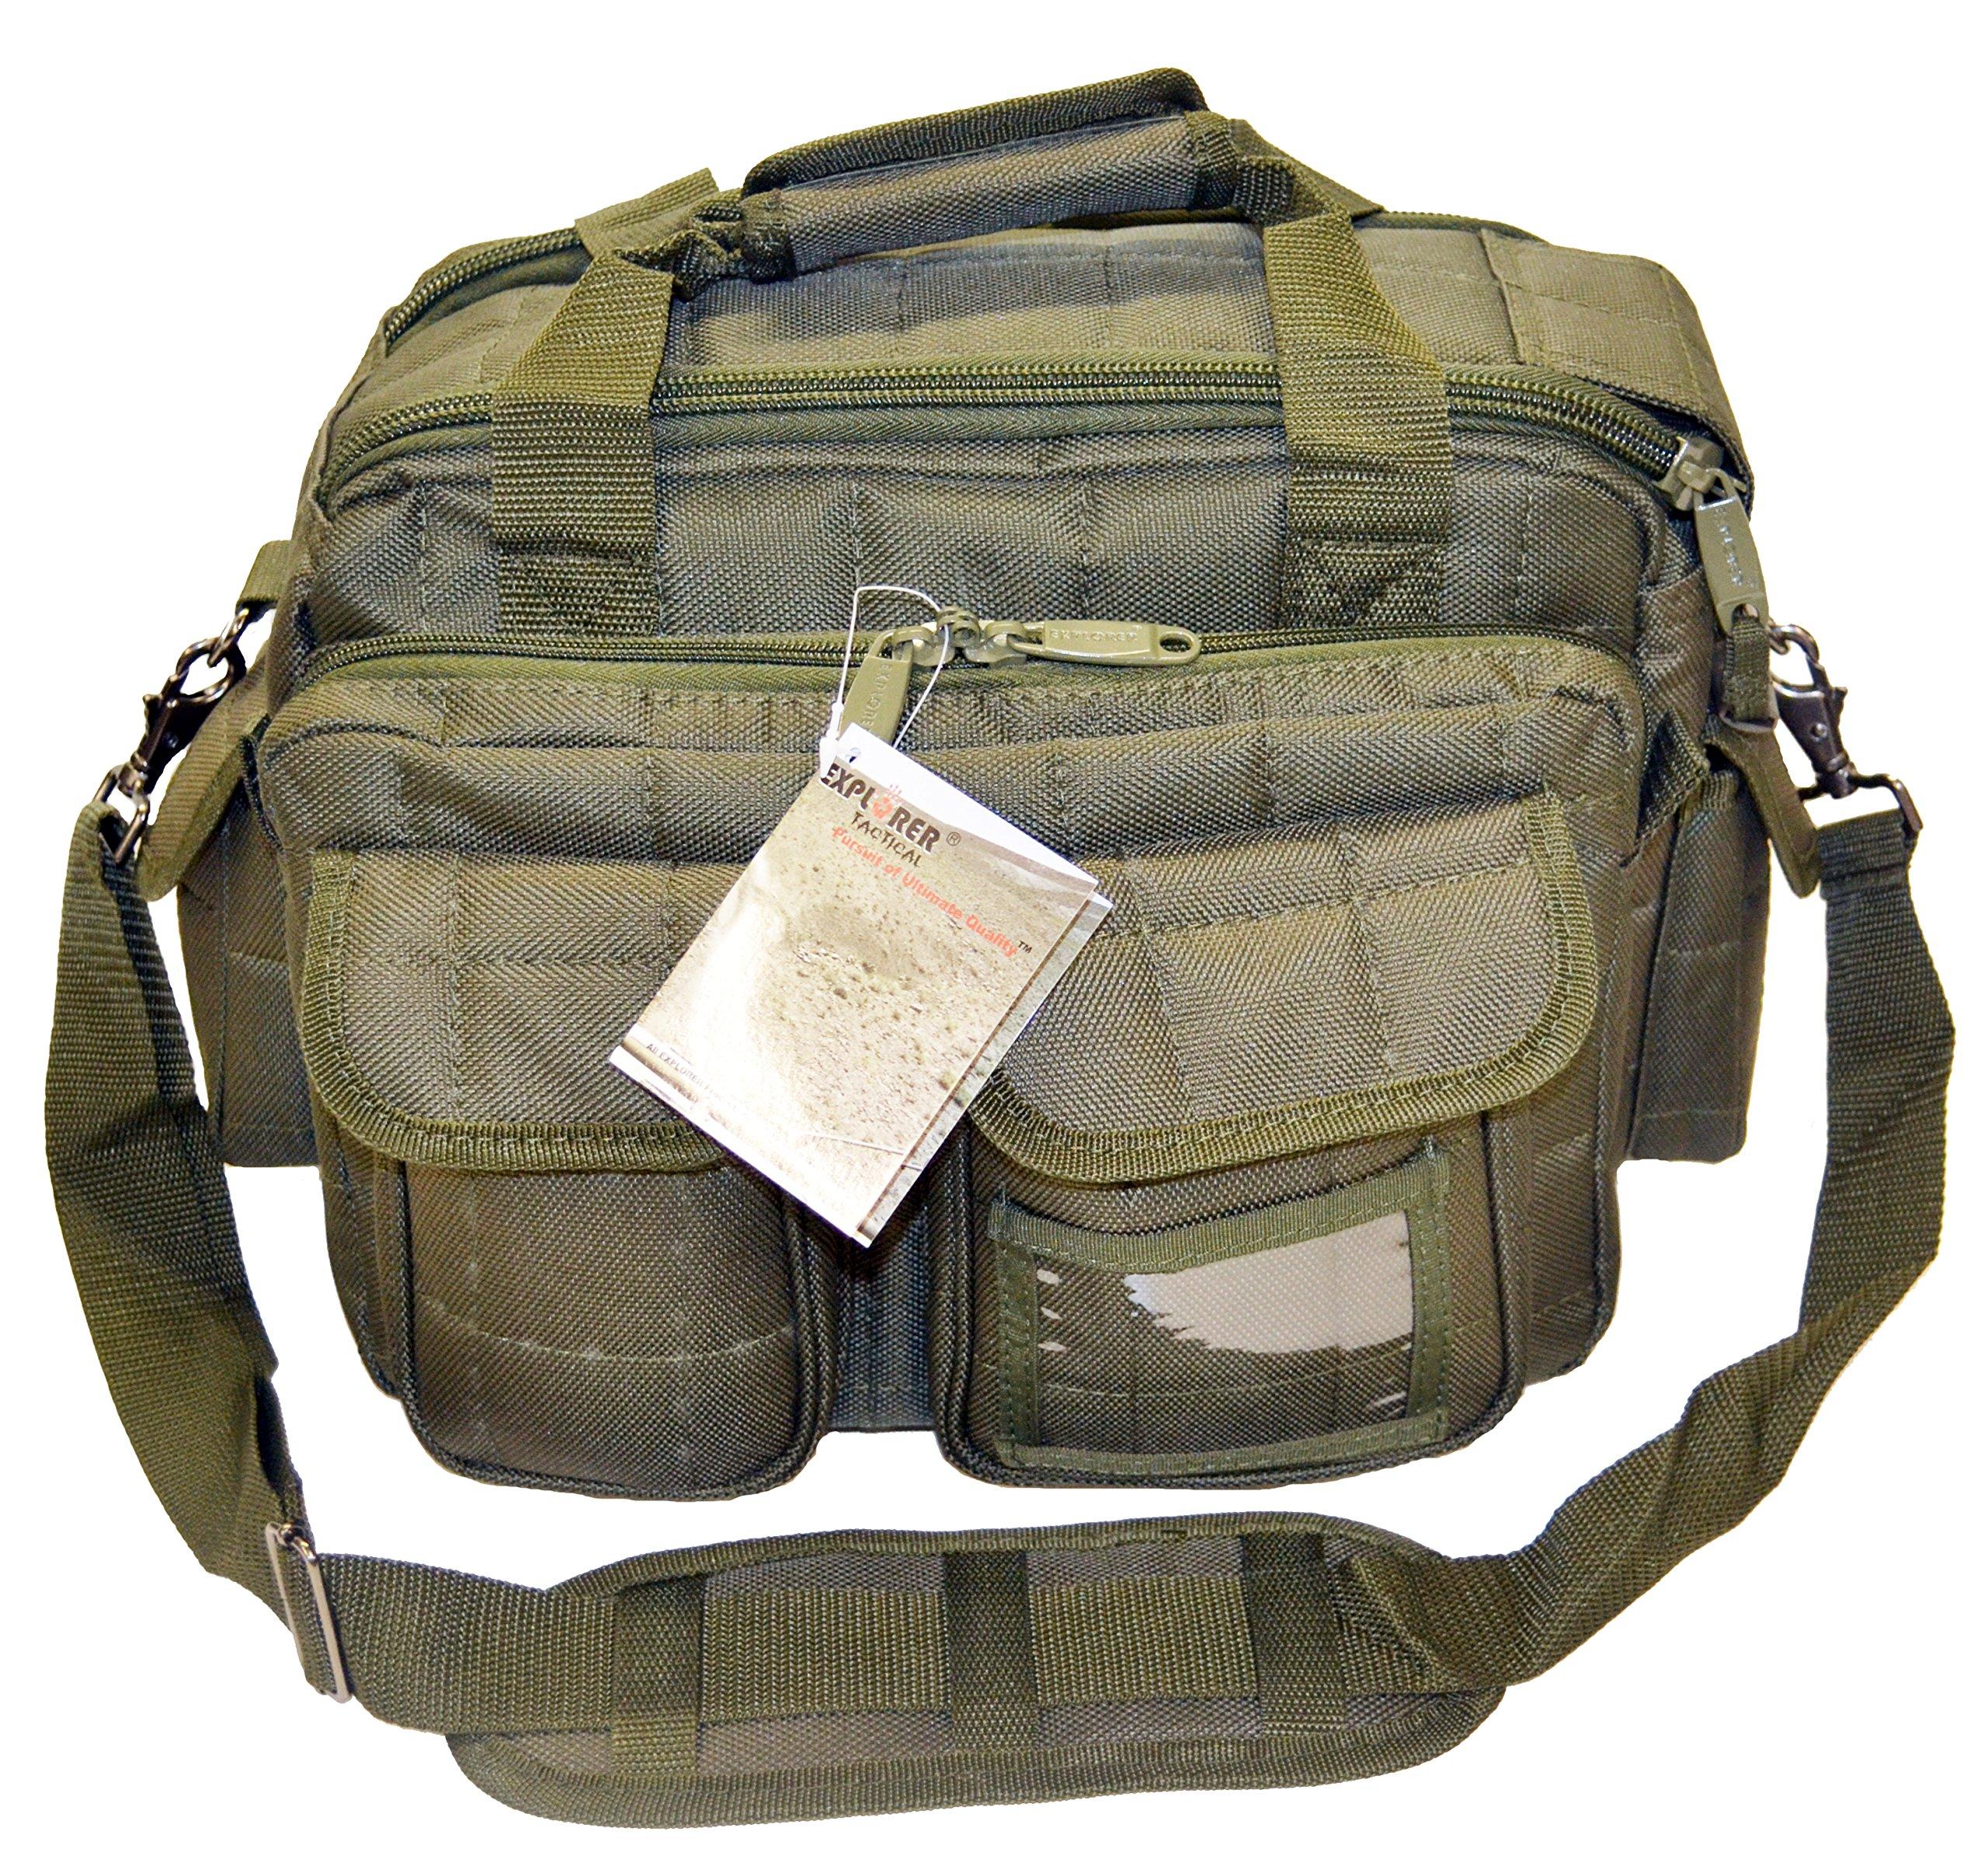 Explorer Tactical 12 Pistol Padded Gun and Gear Bag OD Green by Explorer